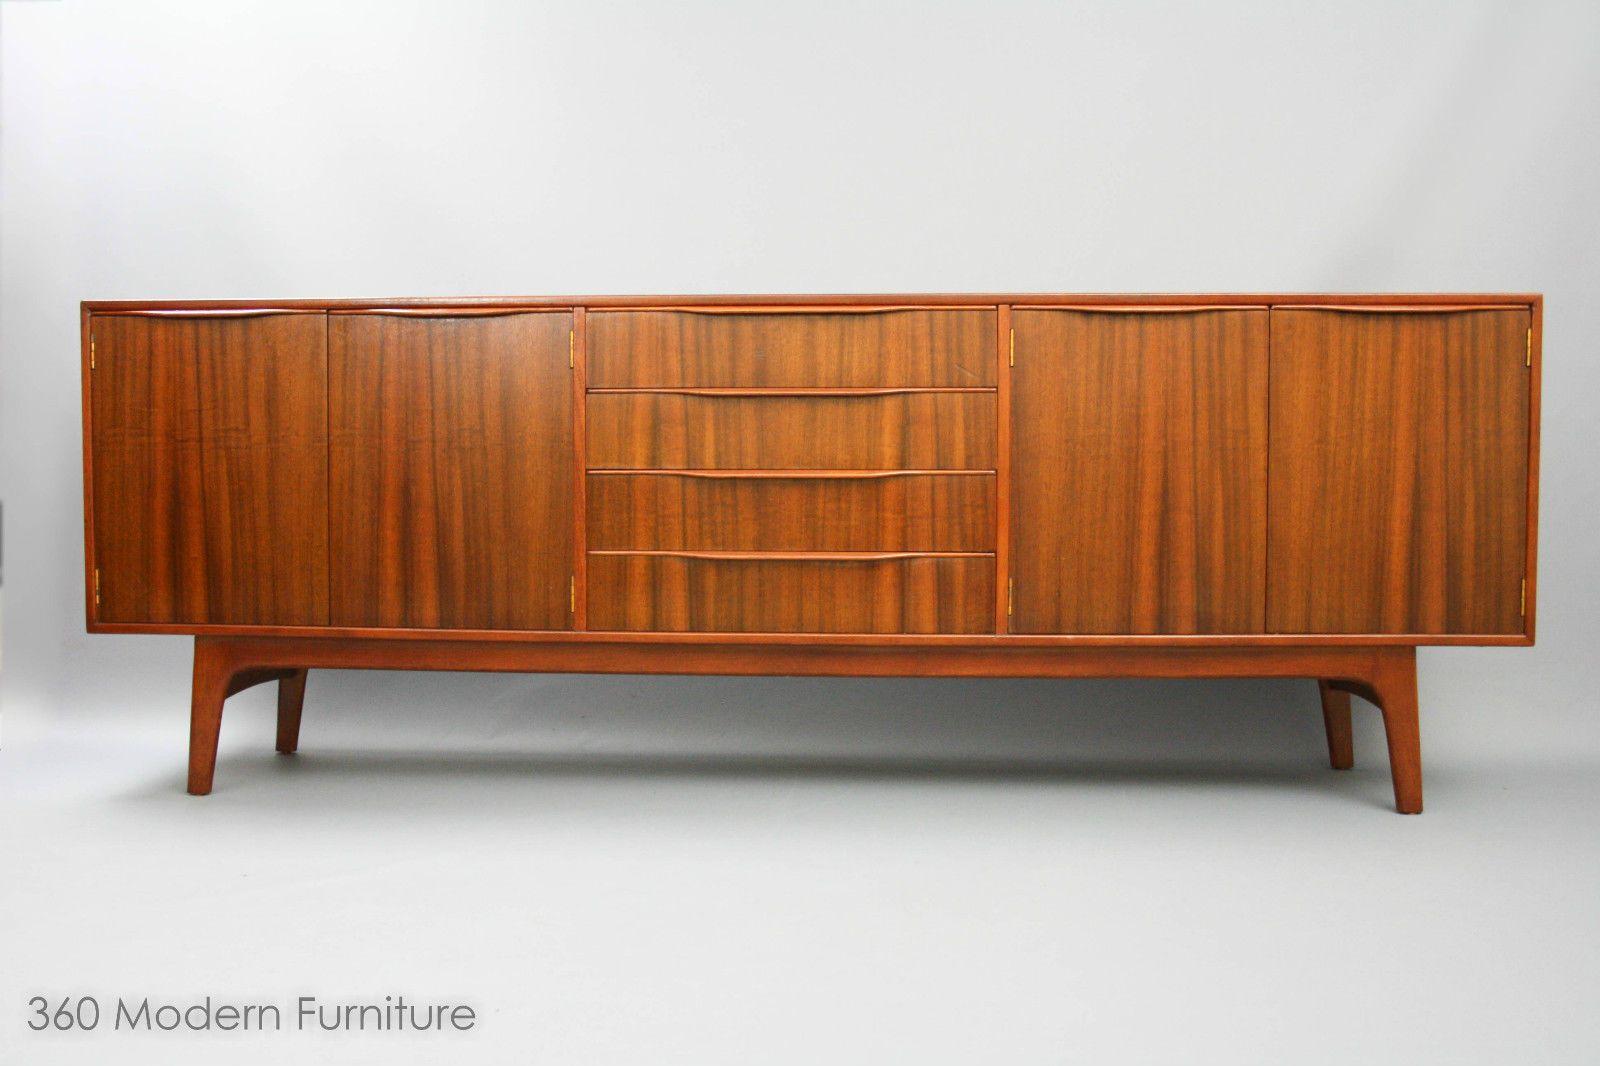 MID Century Noblett Lowline Sideboard Drawers Retro Vintage Parker Danish ERA 211cm Long in Narre Warren, VIC | eBay 360 MODERN FURNITURE